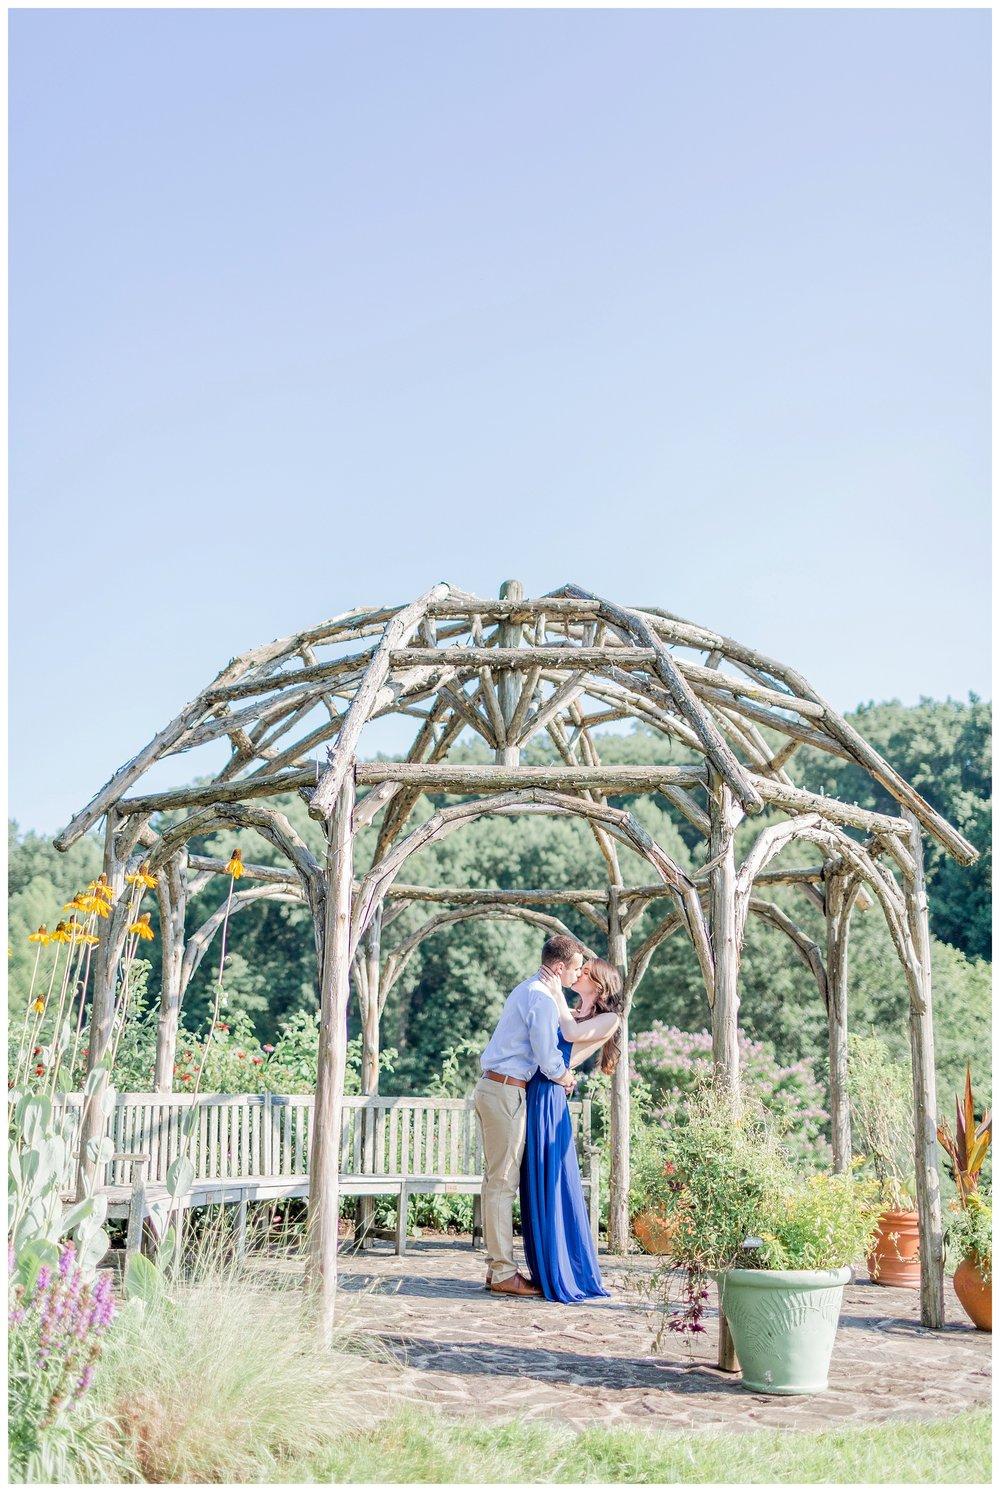 Meadowlark Botanical Garden Engagement | Virginia Wedding Photographer Kir Tuben_0009.jpg